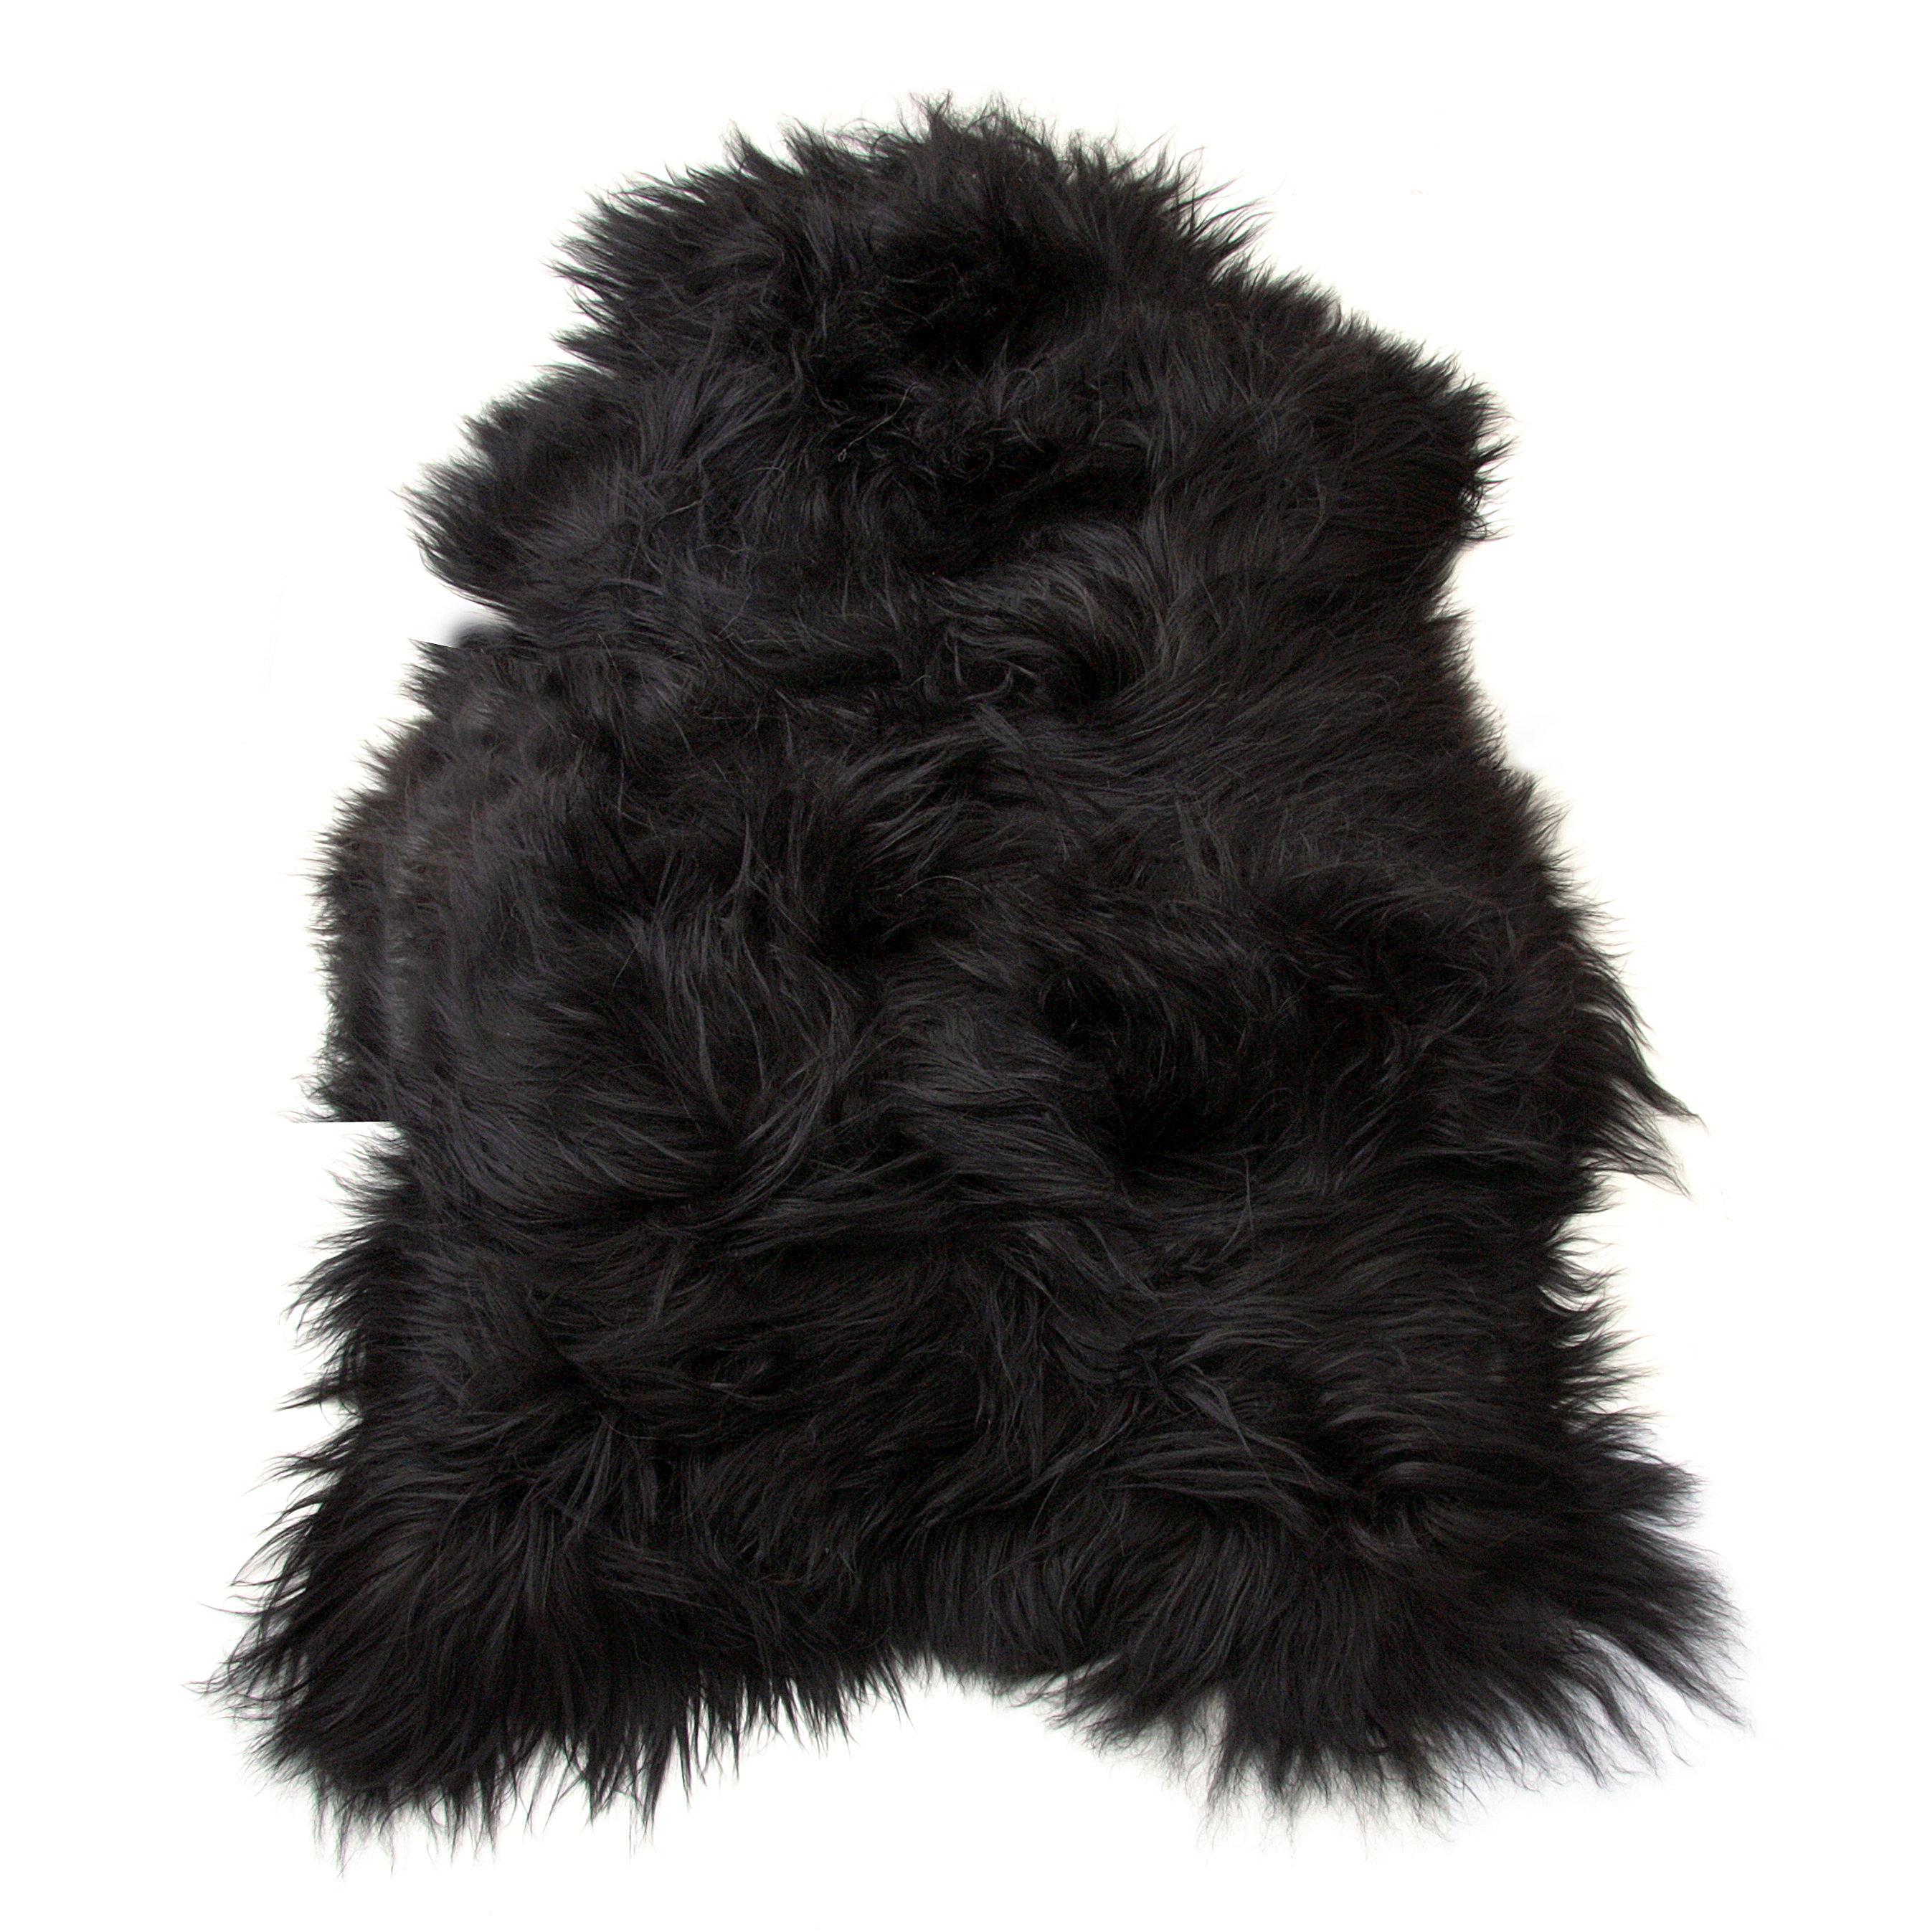 Genuine Natural Icelandic black Sheepskin Rug 2 x 3.5